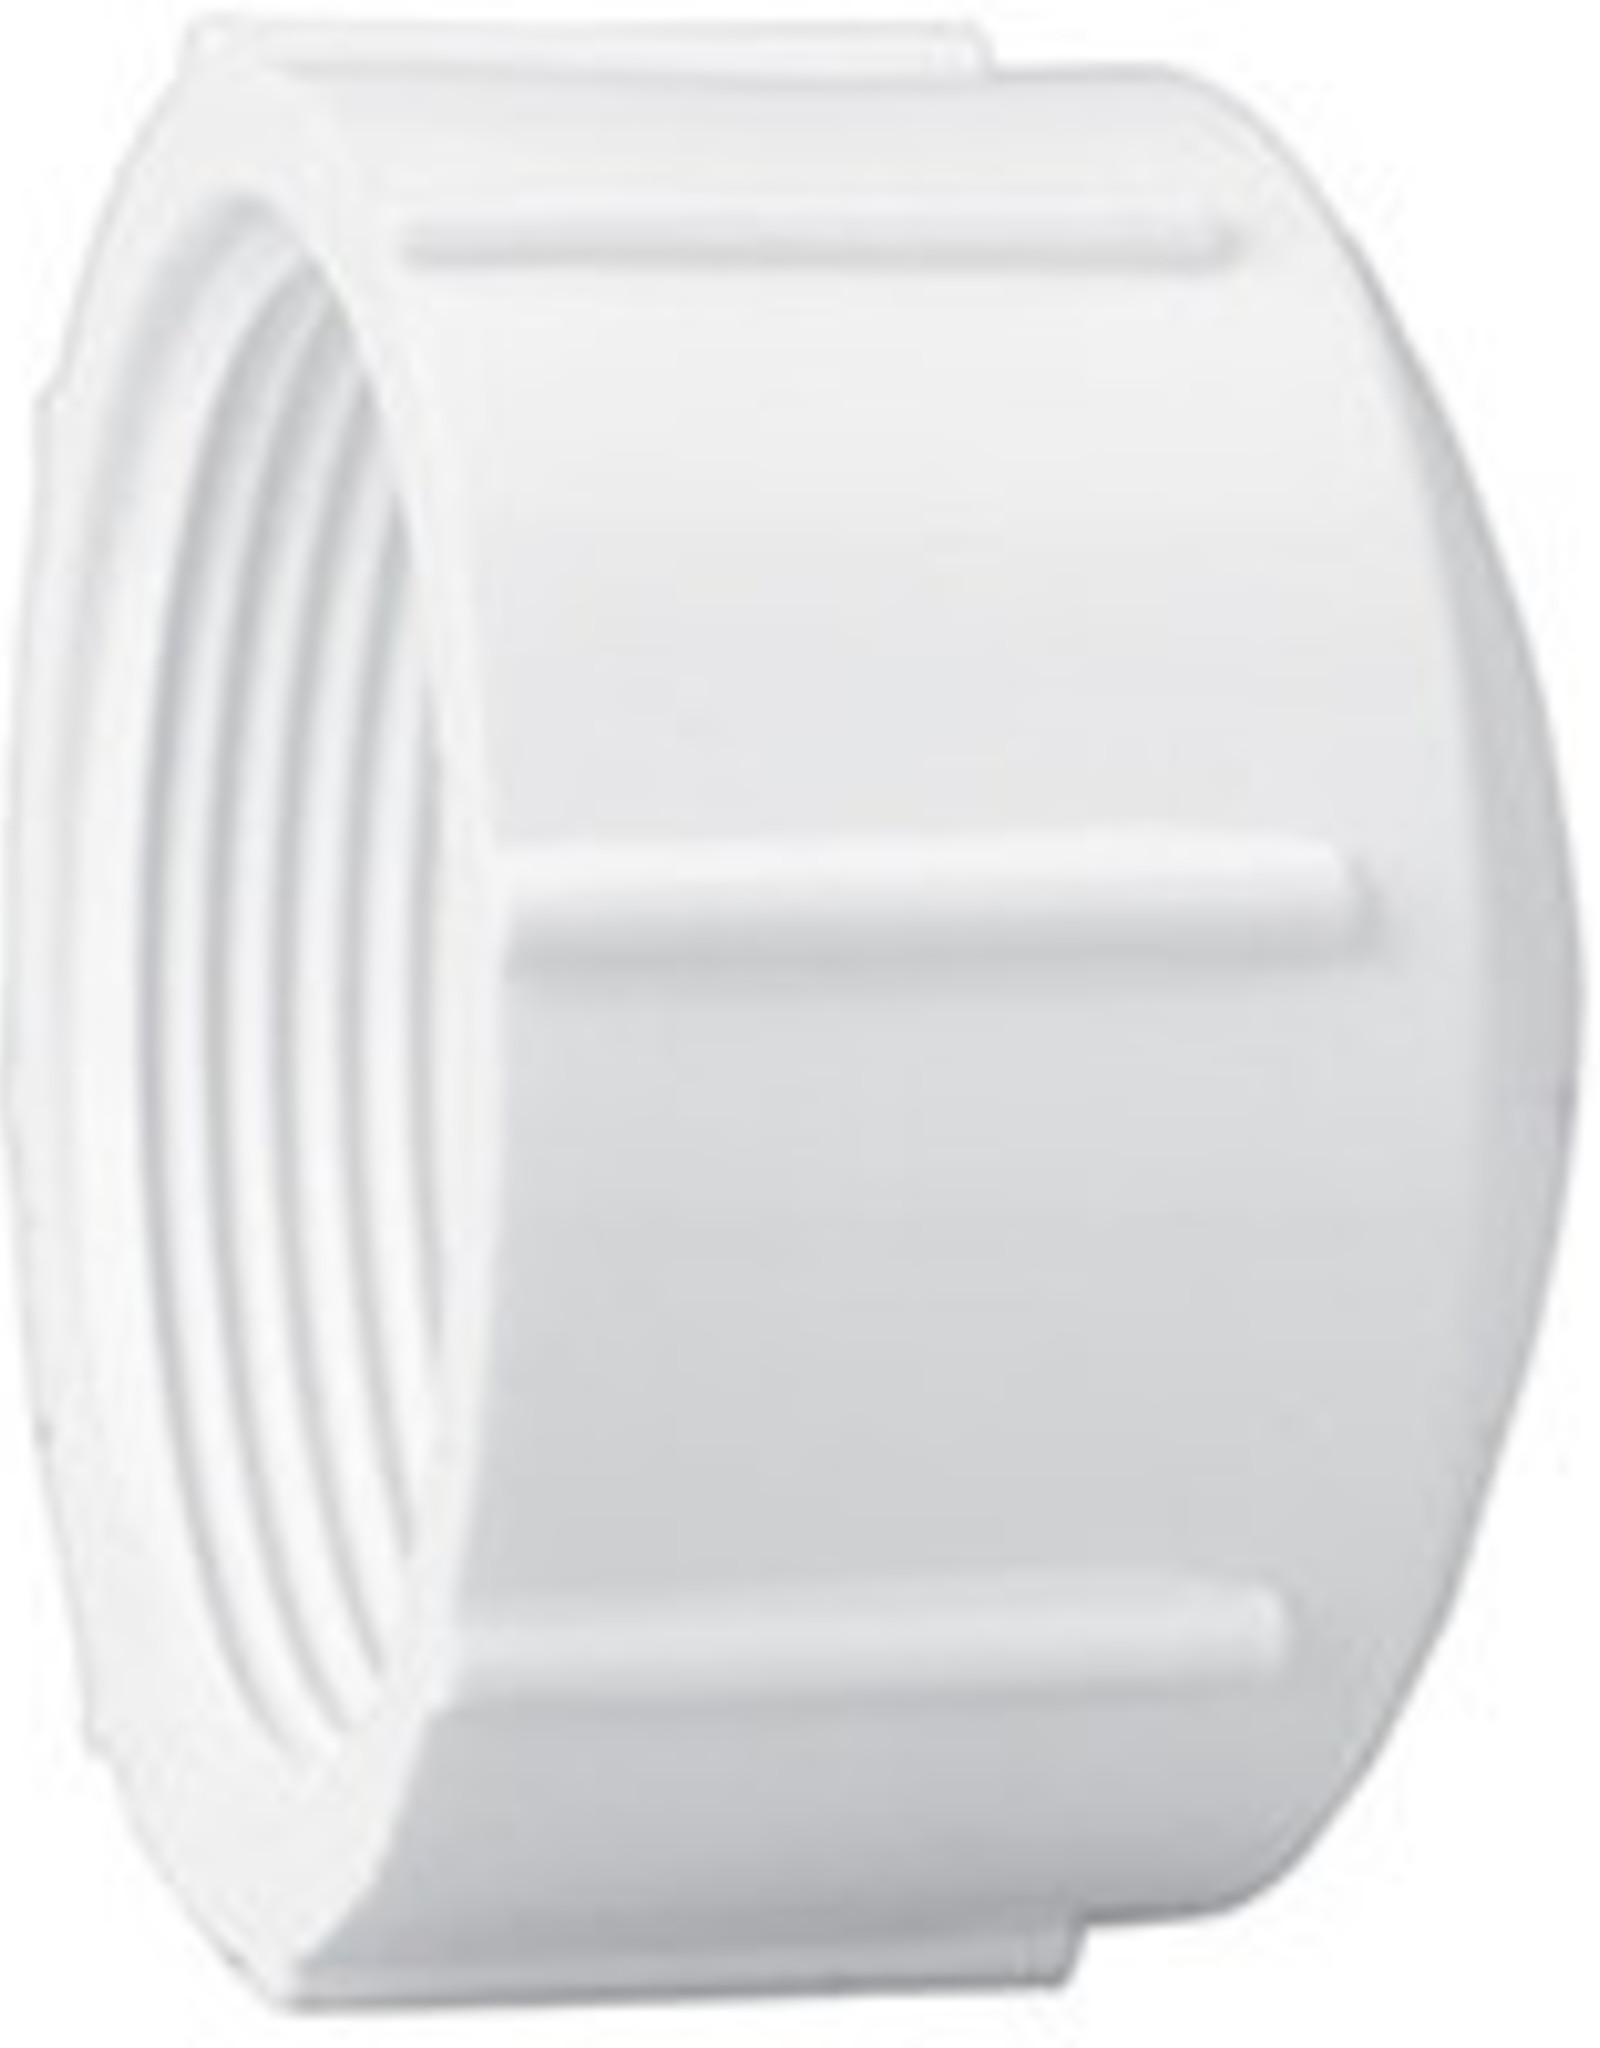 "Lasco Fittings PVC 1/2"" Threaded Cap Fitting SCH 40 Pressure"